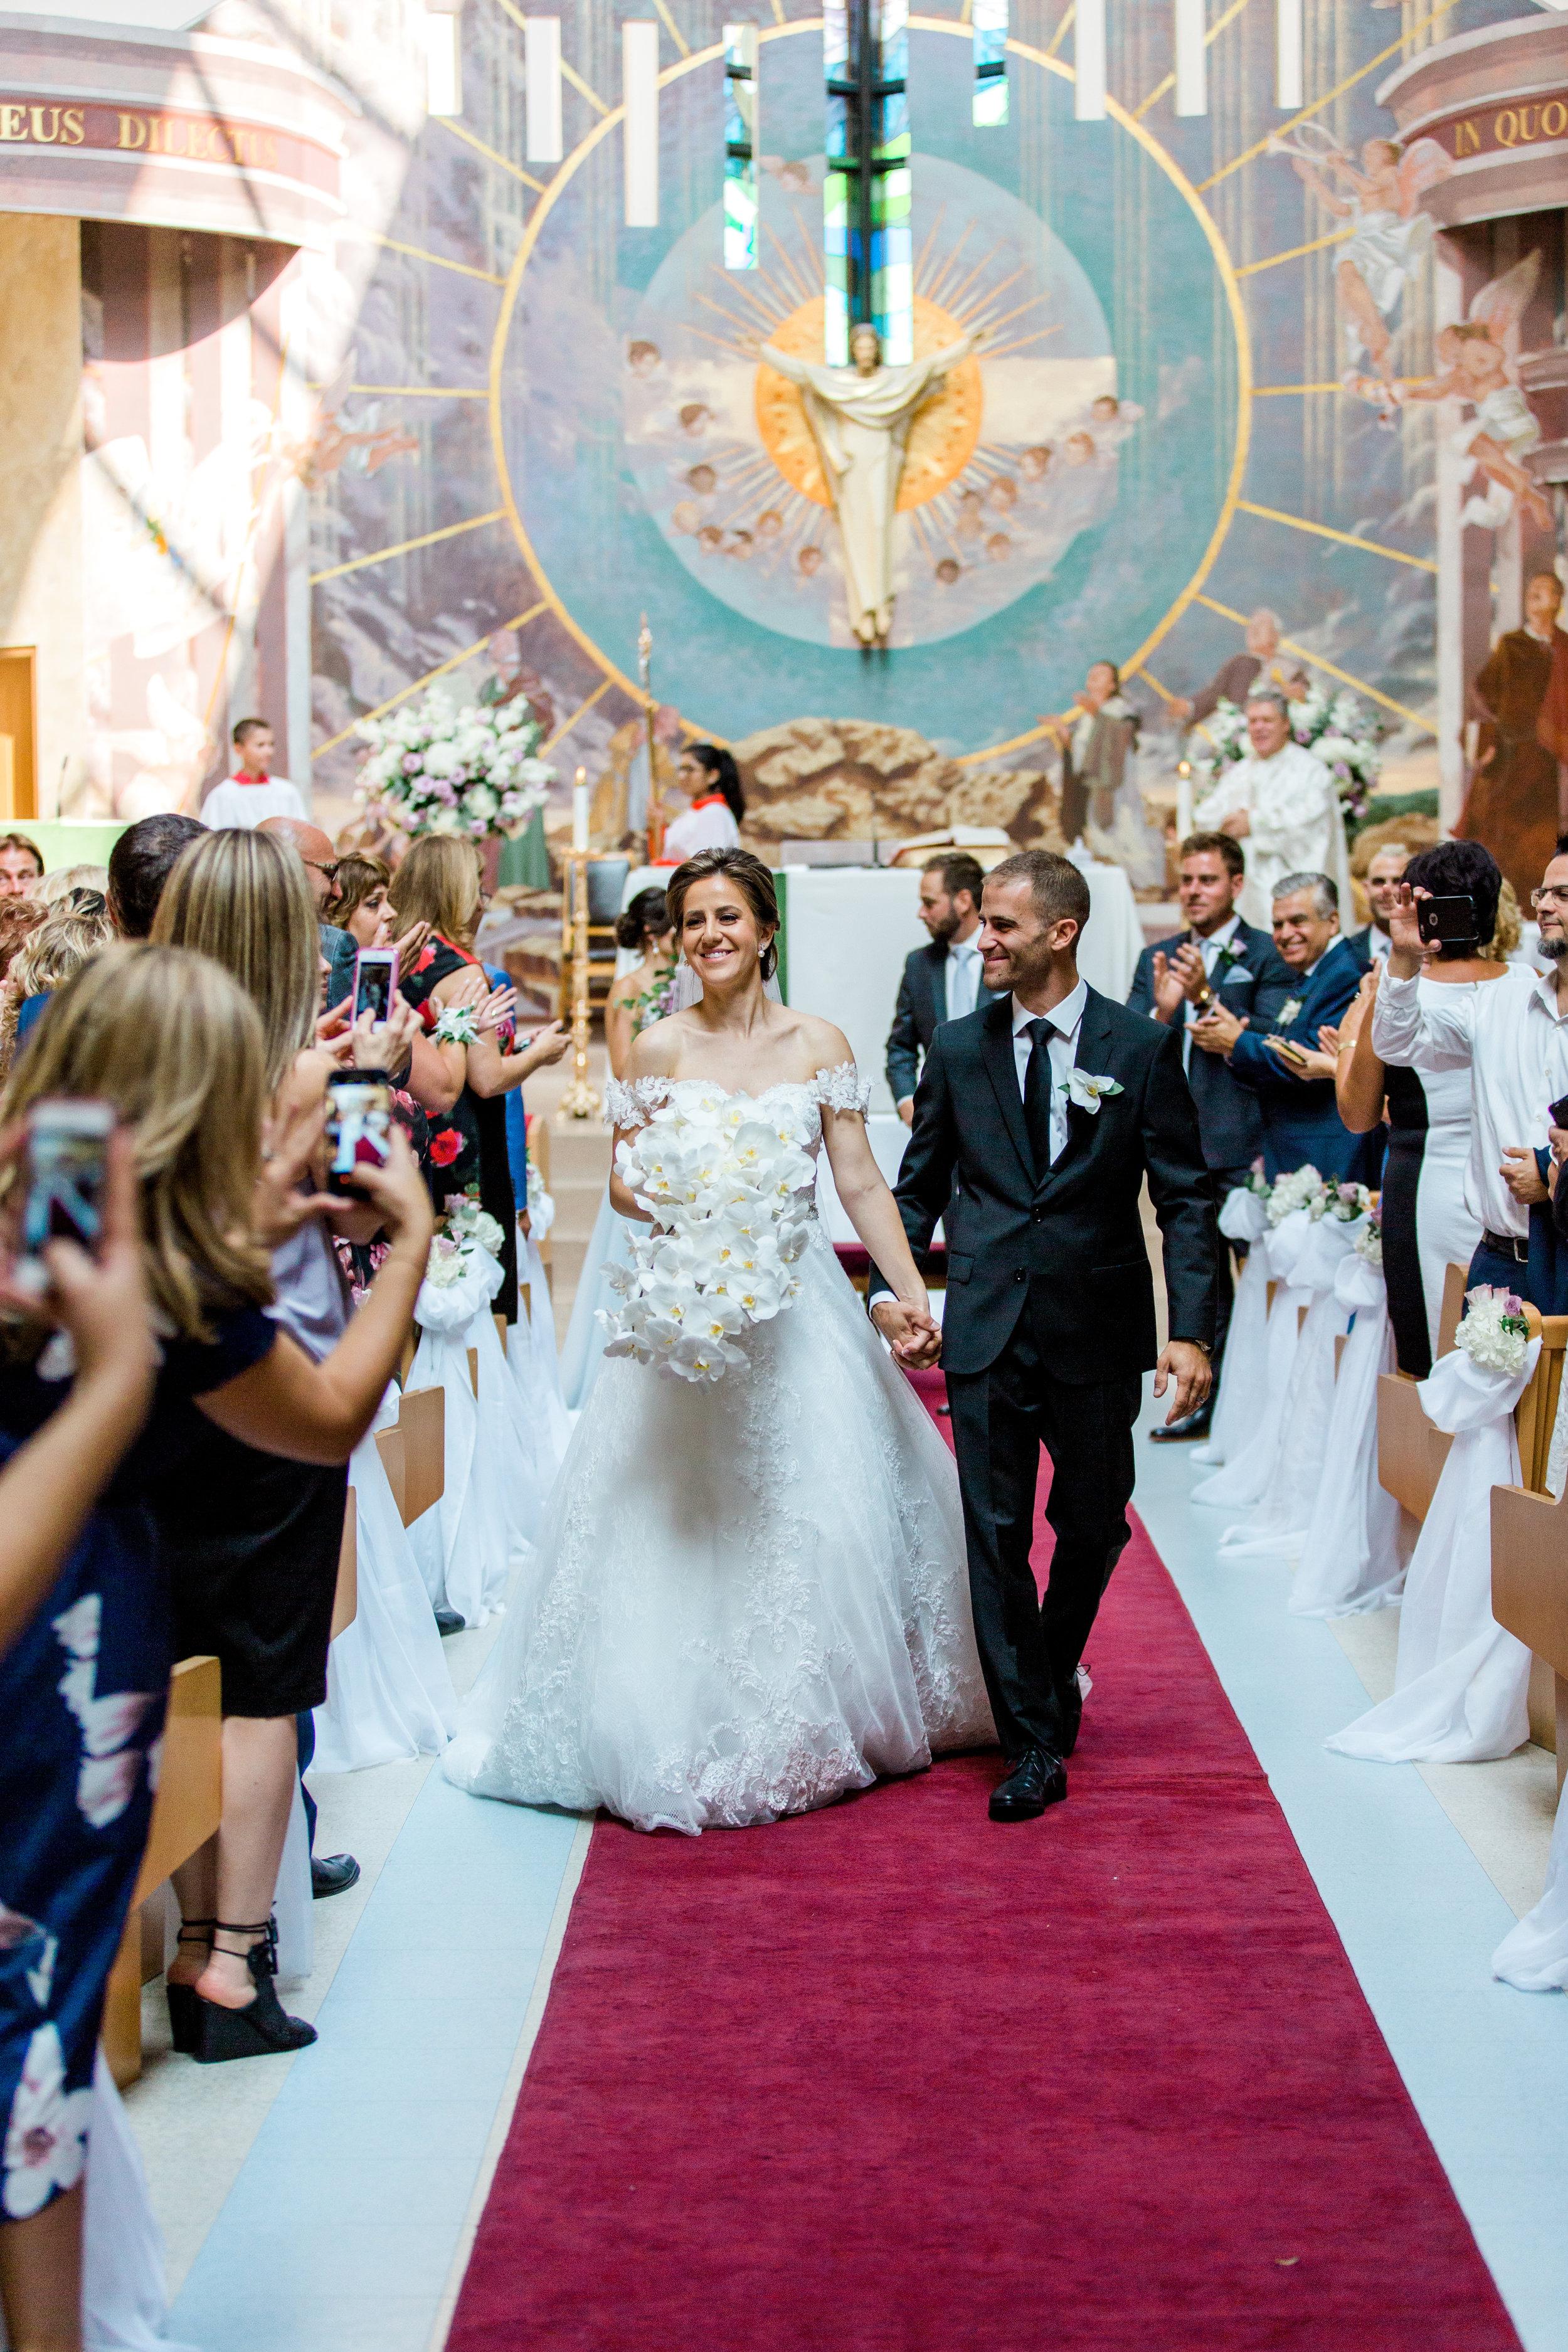 Danielle-Giroux-Amir-Golbazi-Toronto-Wedding-Photographer-Bellvue-Manor_DeLuca_1-524.jpg